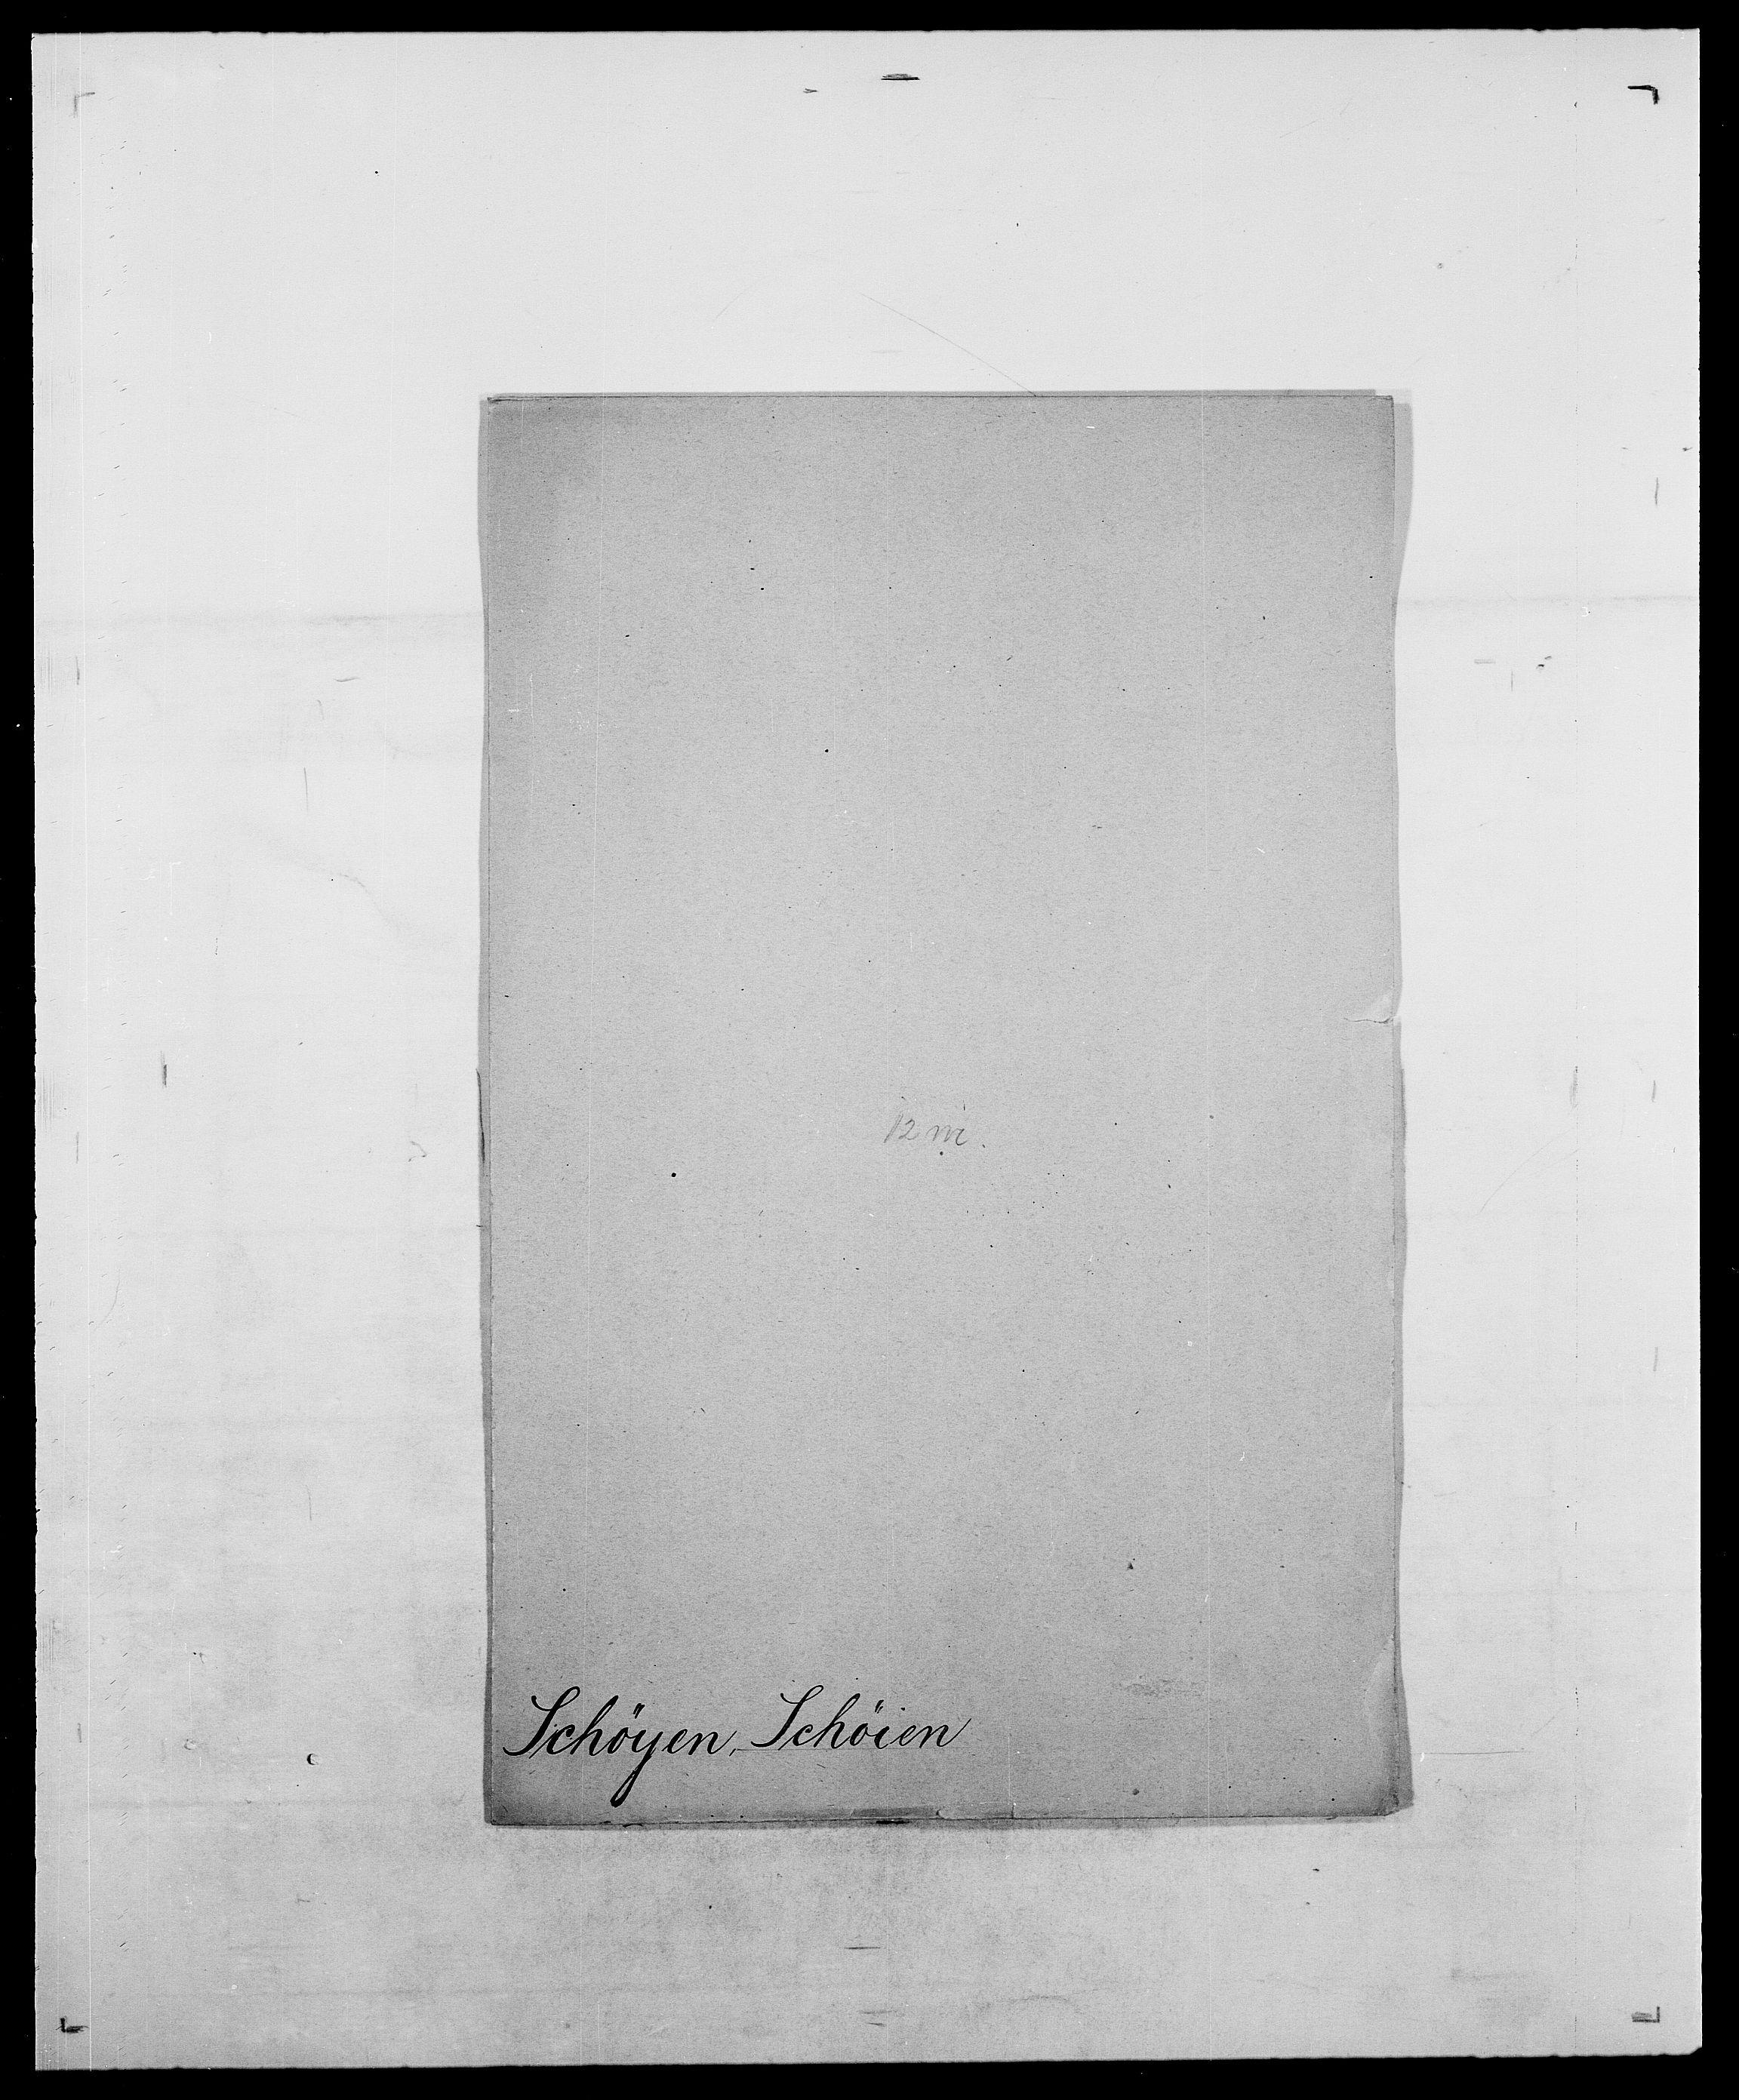 SAO, Delgobe, Charles Antoine - samling, D/Da/L0035: Schnabel - sjetman, s. 501